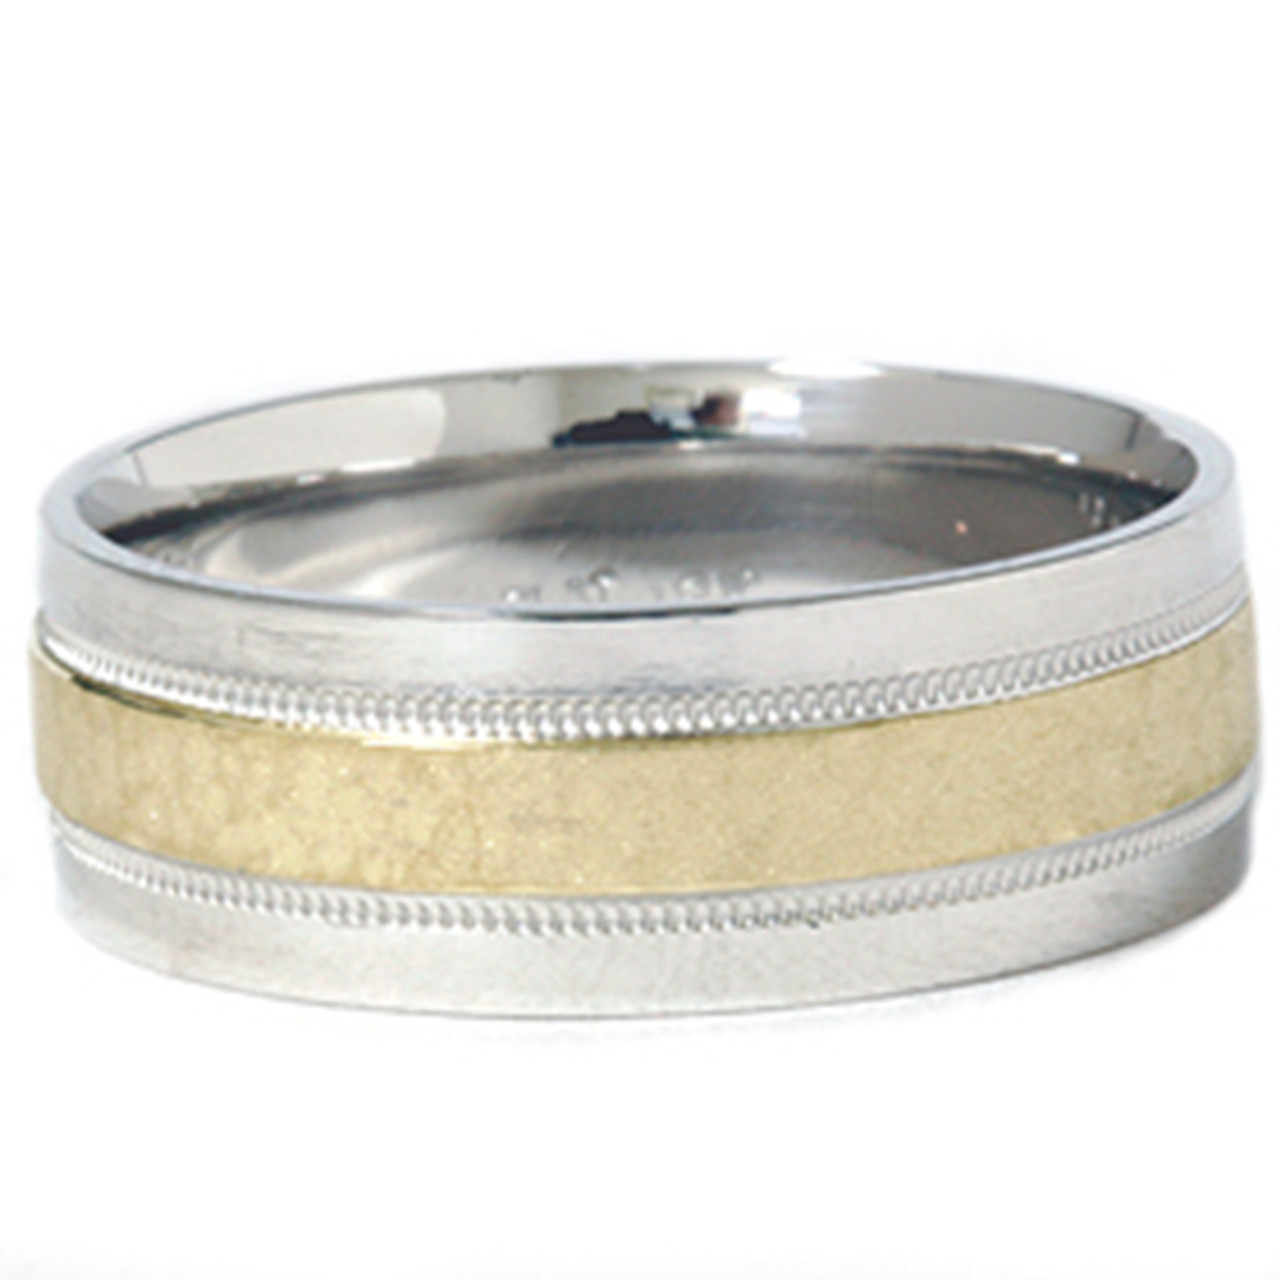 Mens 950 Platinum 18K Gold Hammered Wedding Band Ring